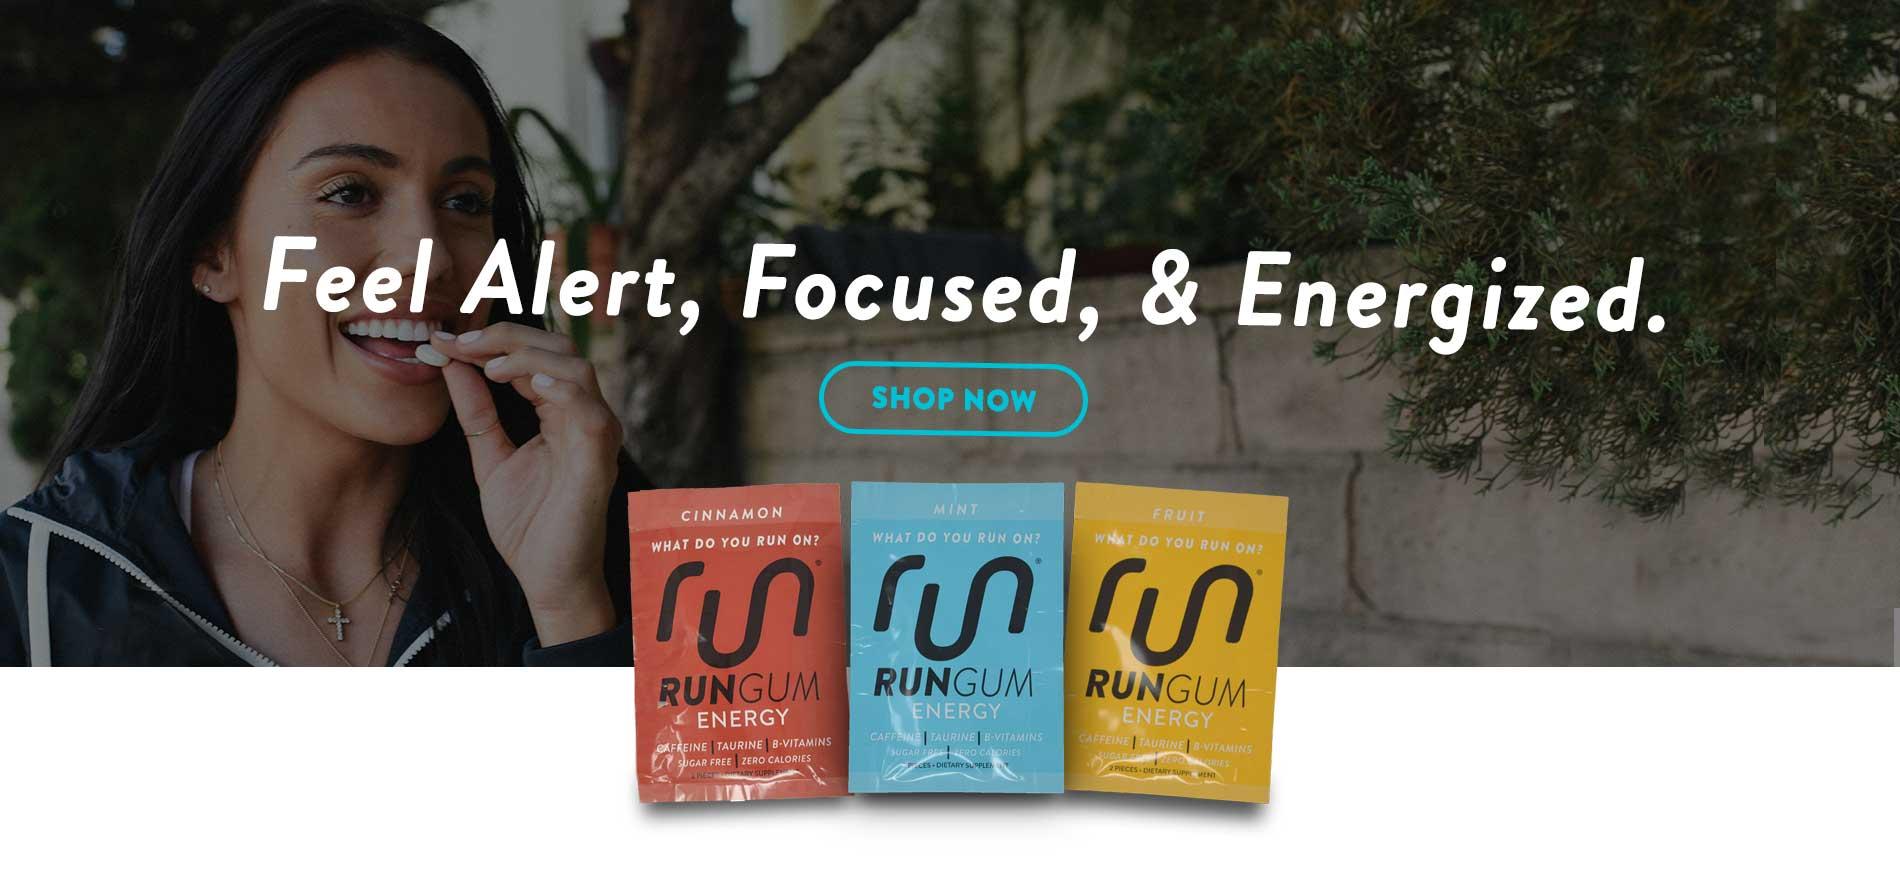 Gum with caffeine for running